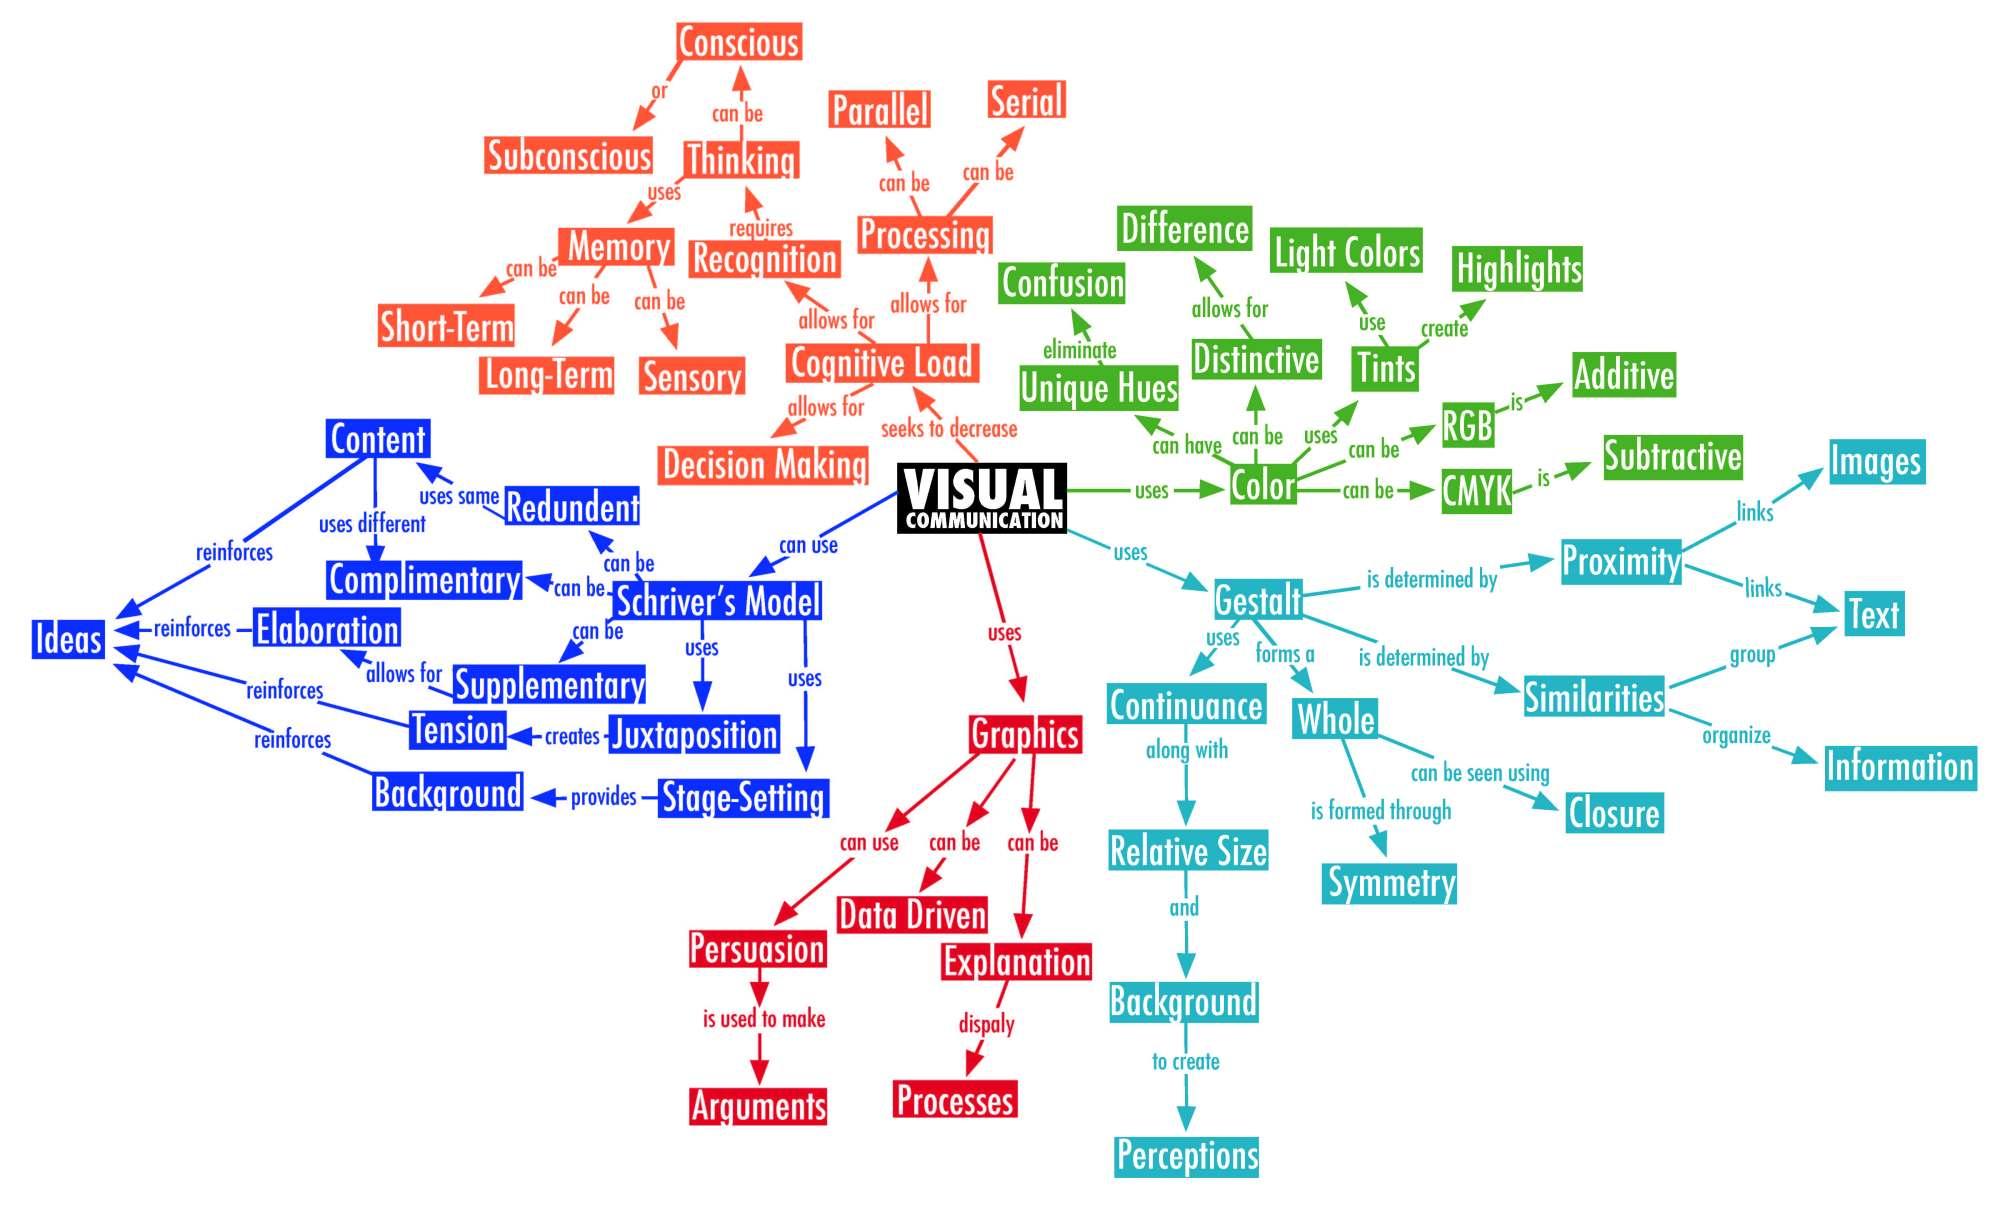 hight resolution of communication visit https rossfitzy files wordpress com 2012 05 final visual comm map jpg